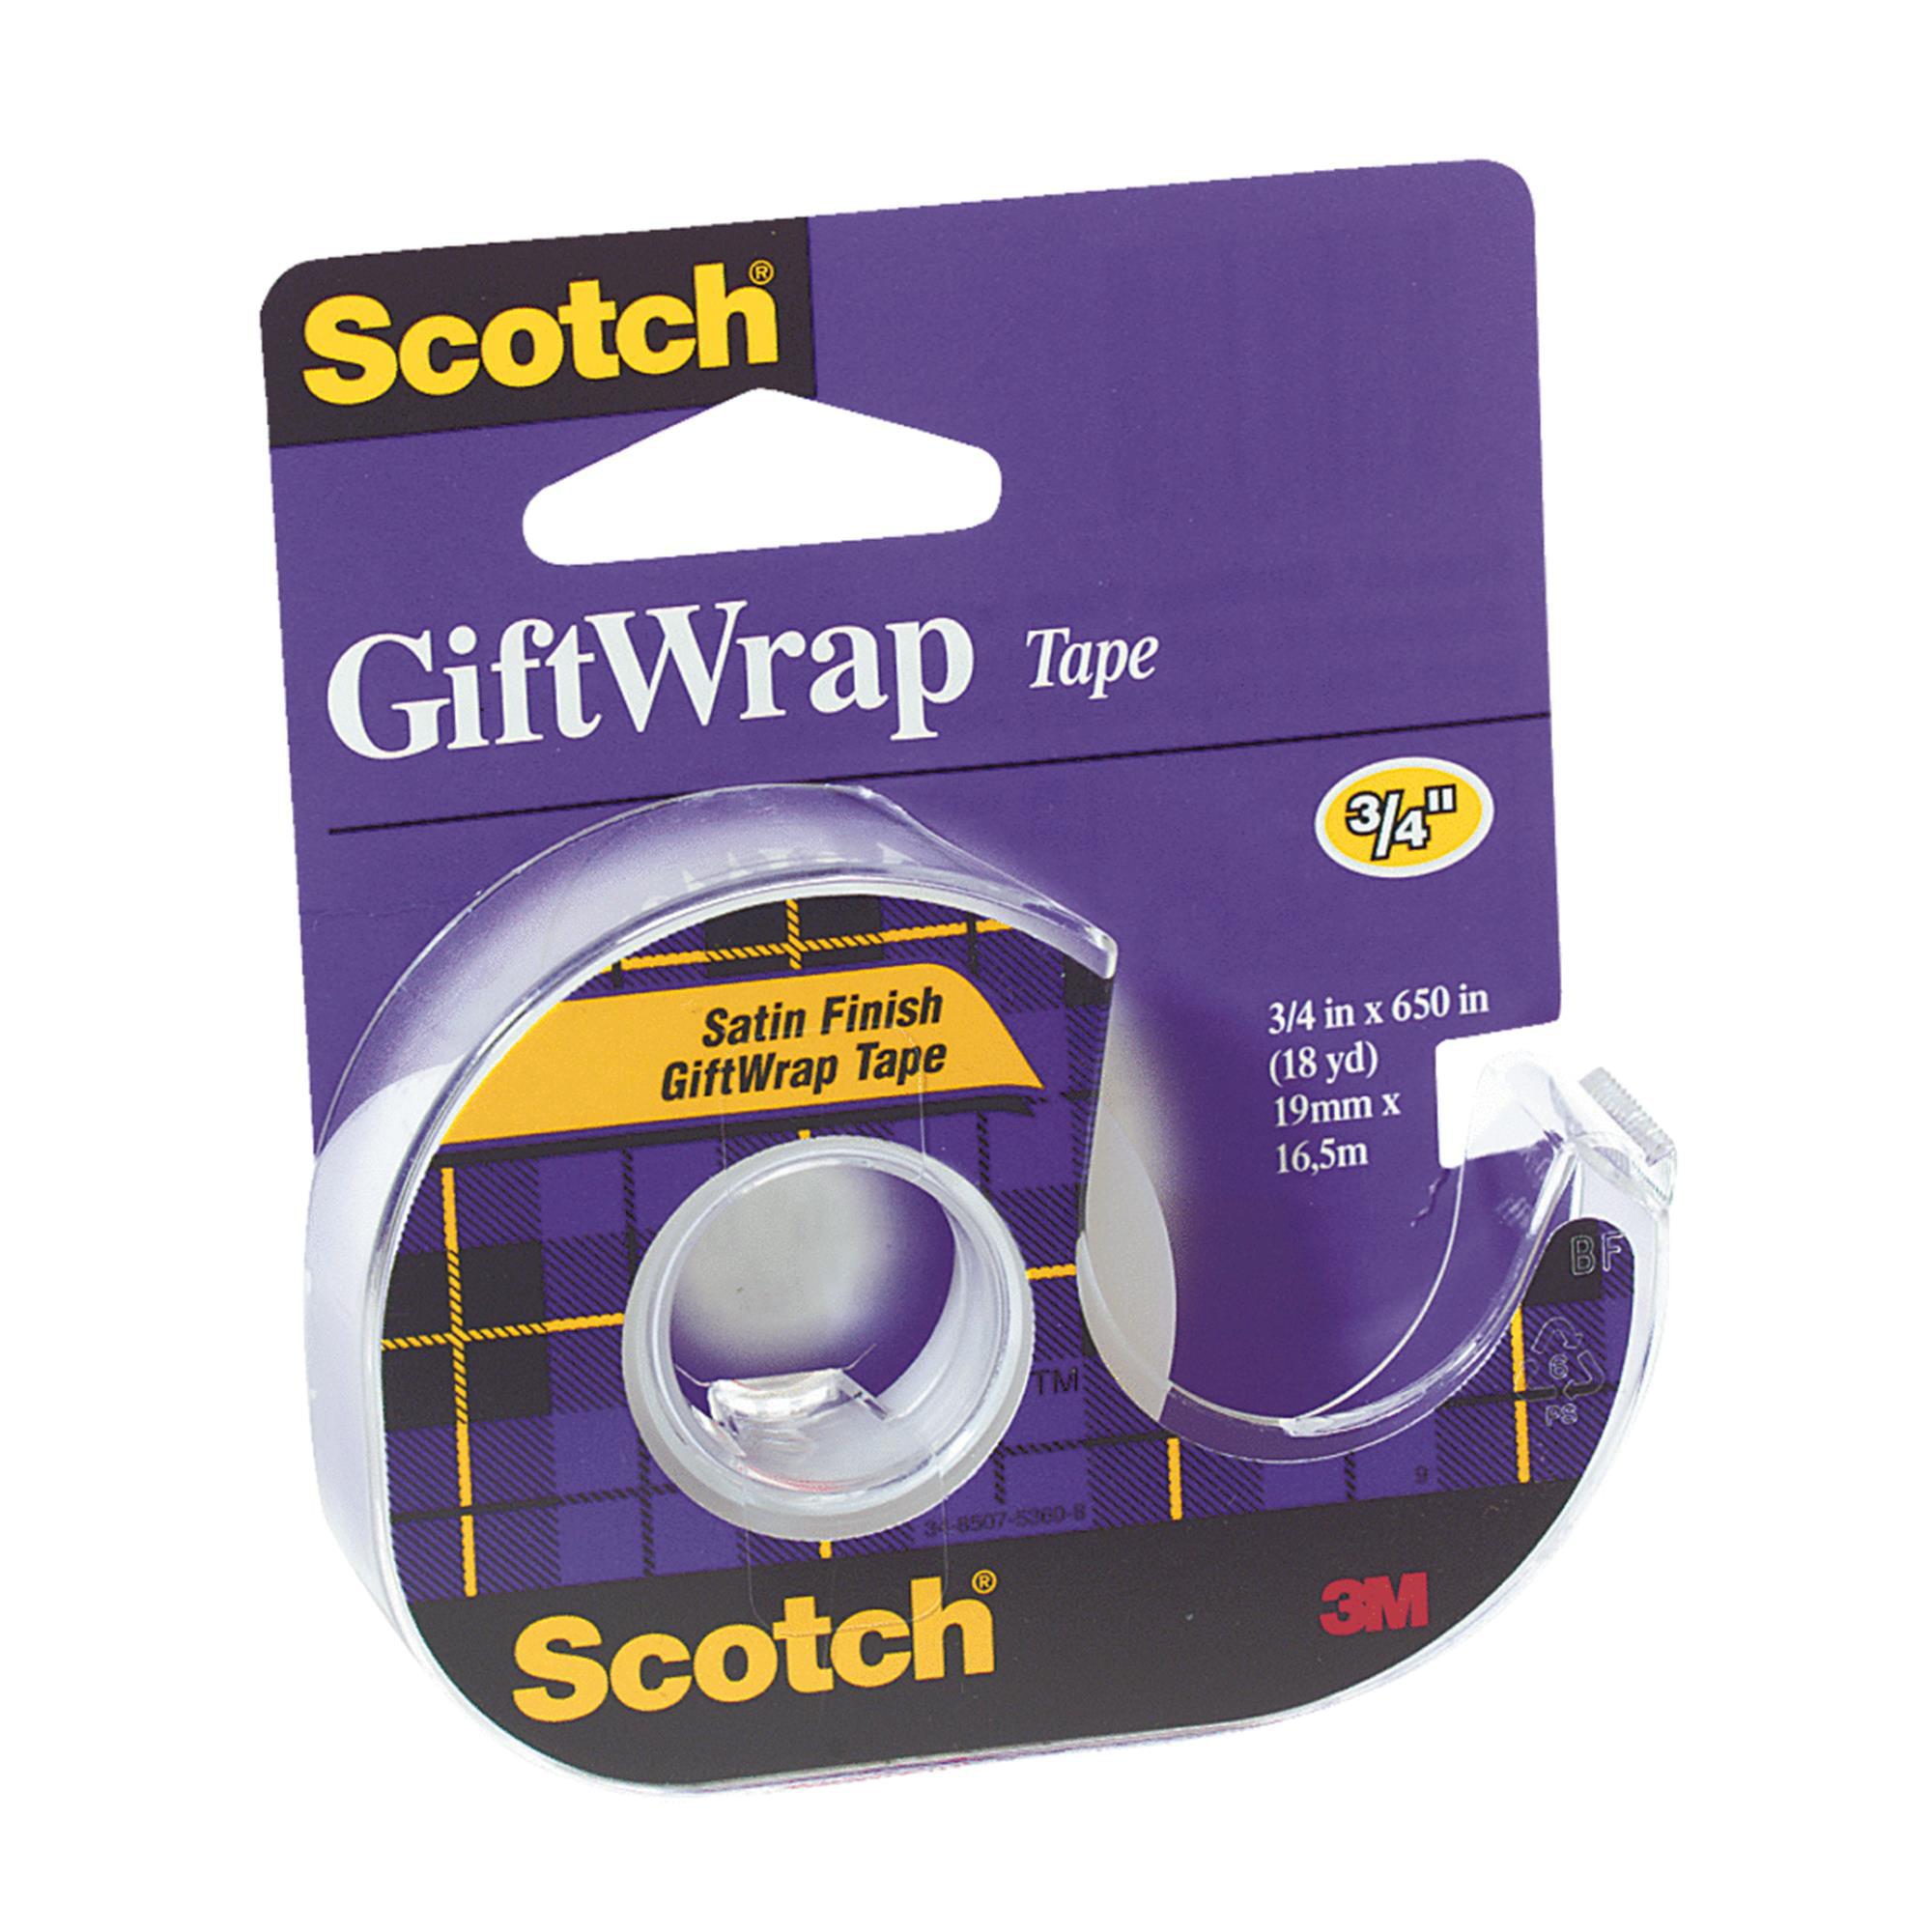 Scotch Gift-Wrap Transparent Tape